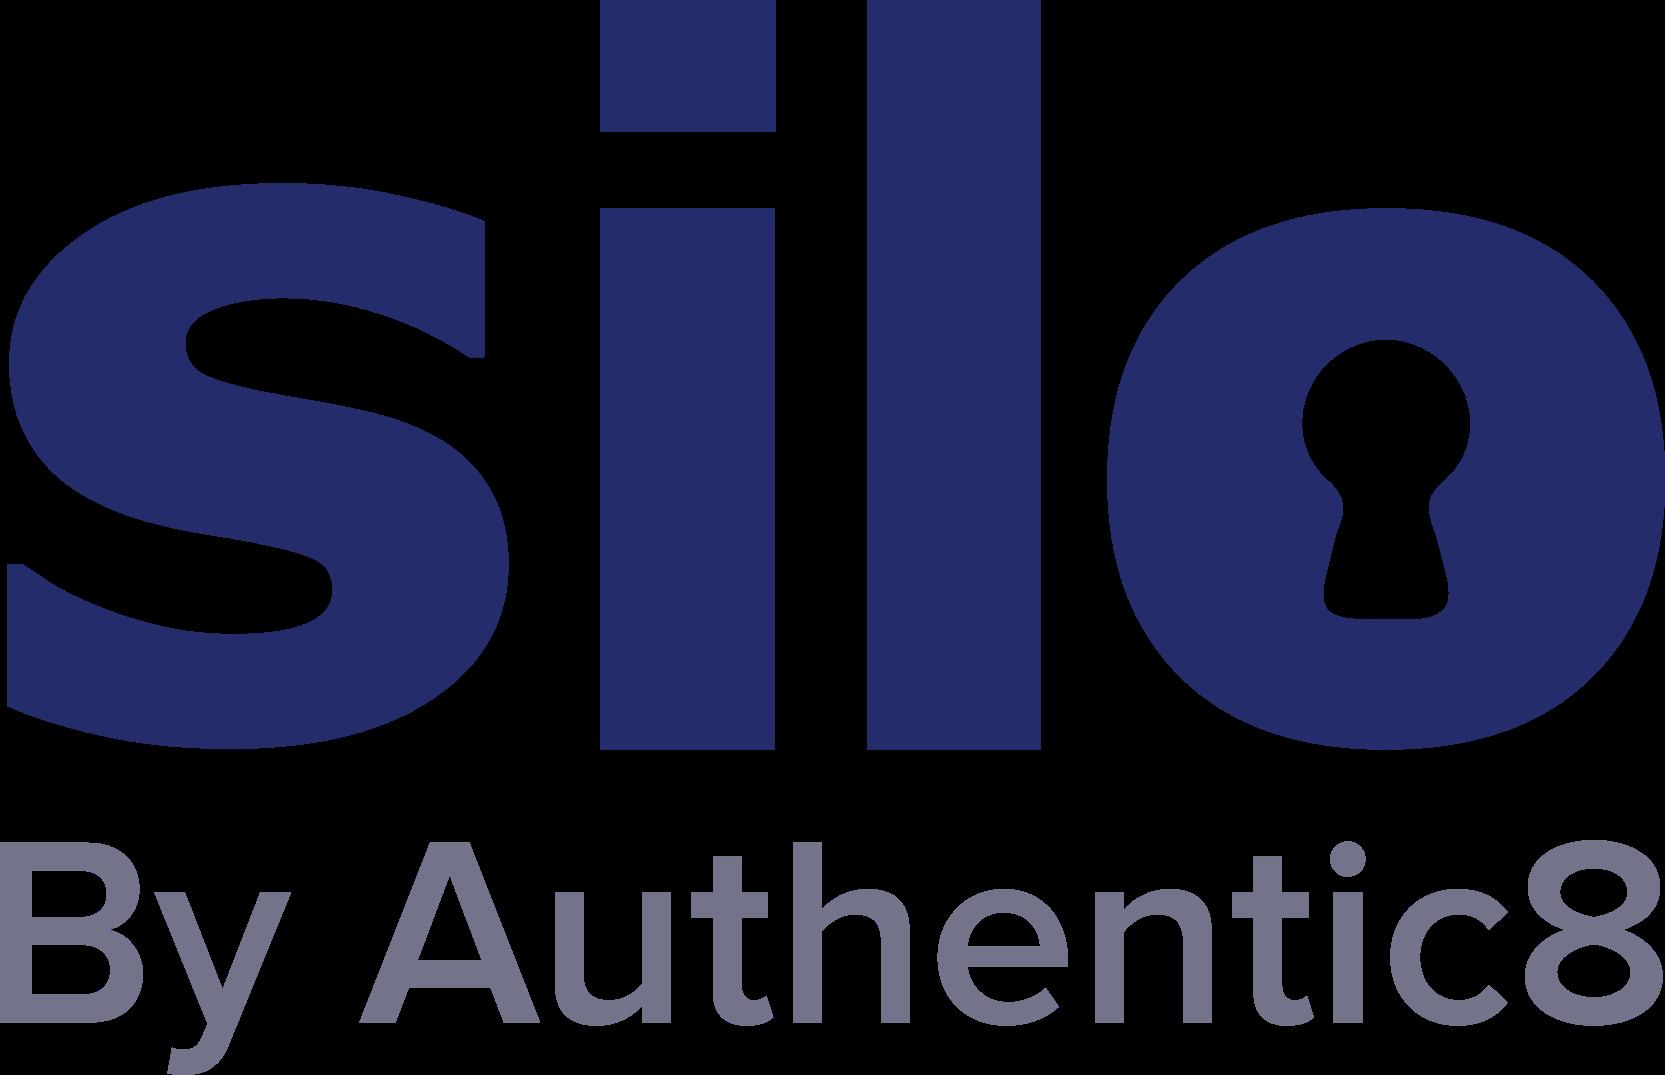 Silo- Authentic 8